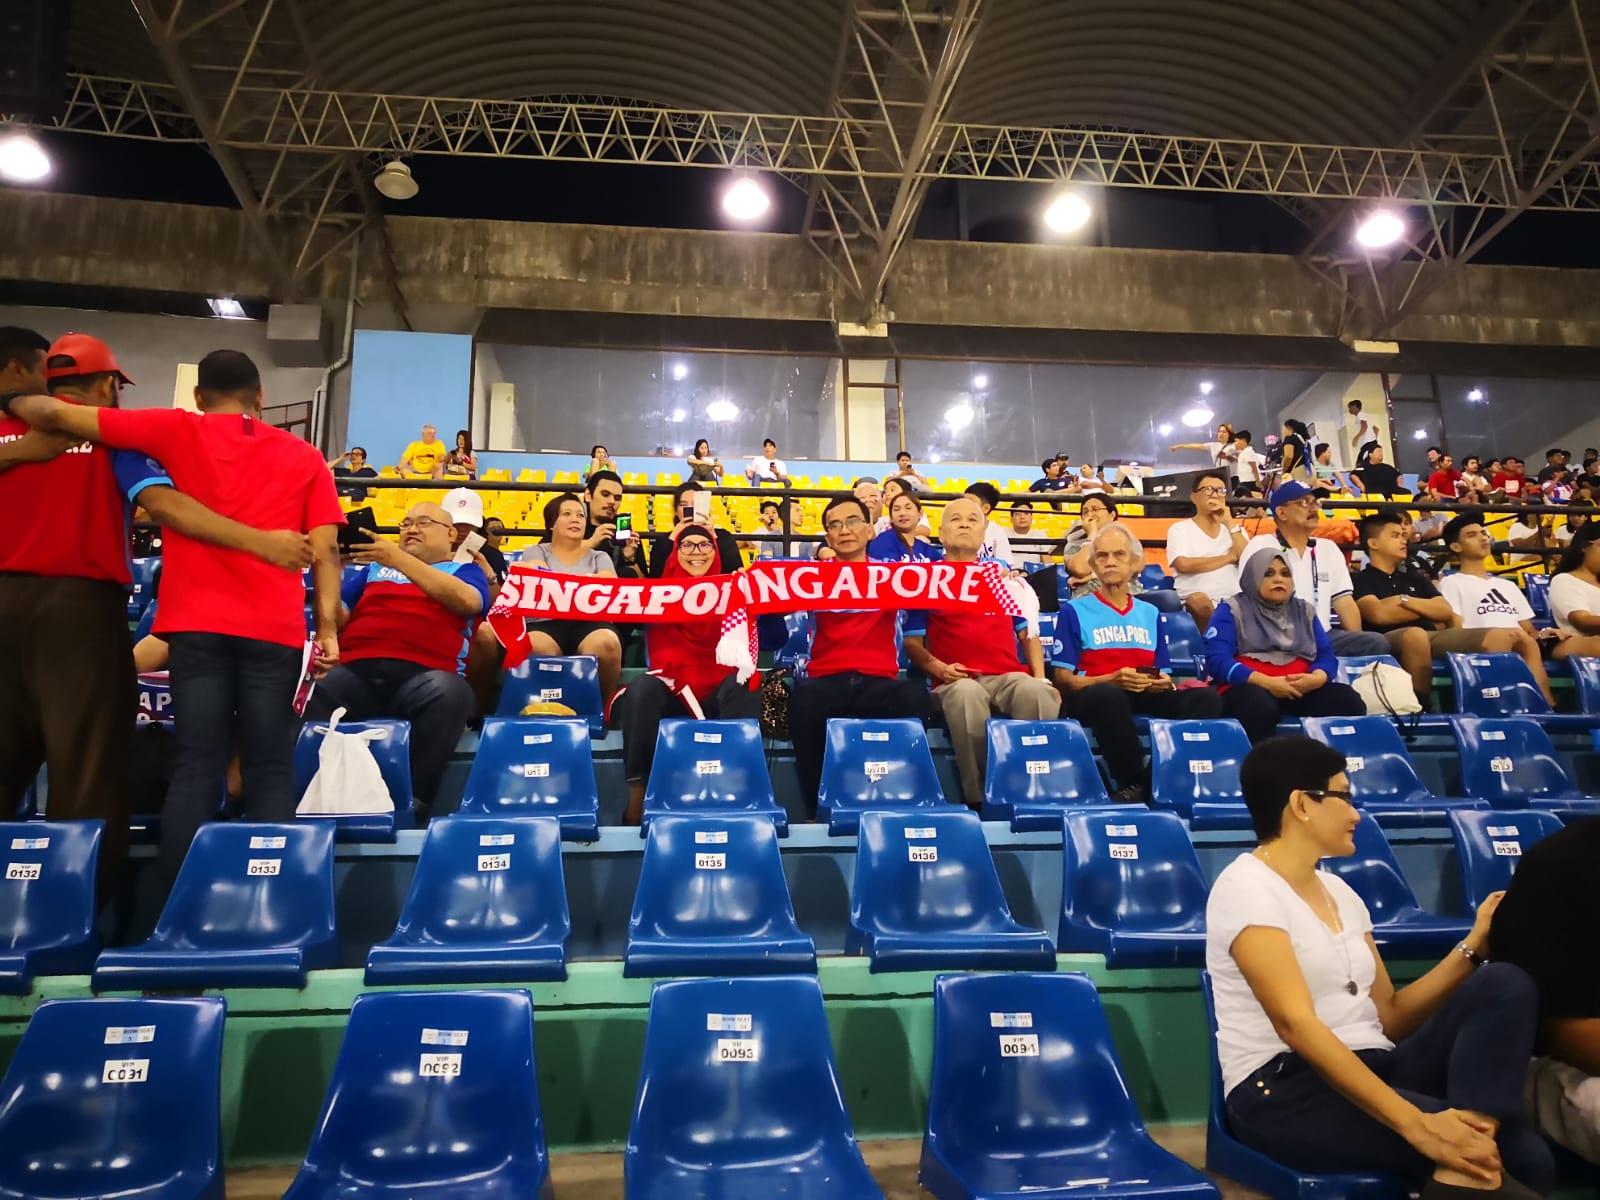 singapore die hard fans